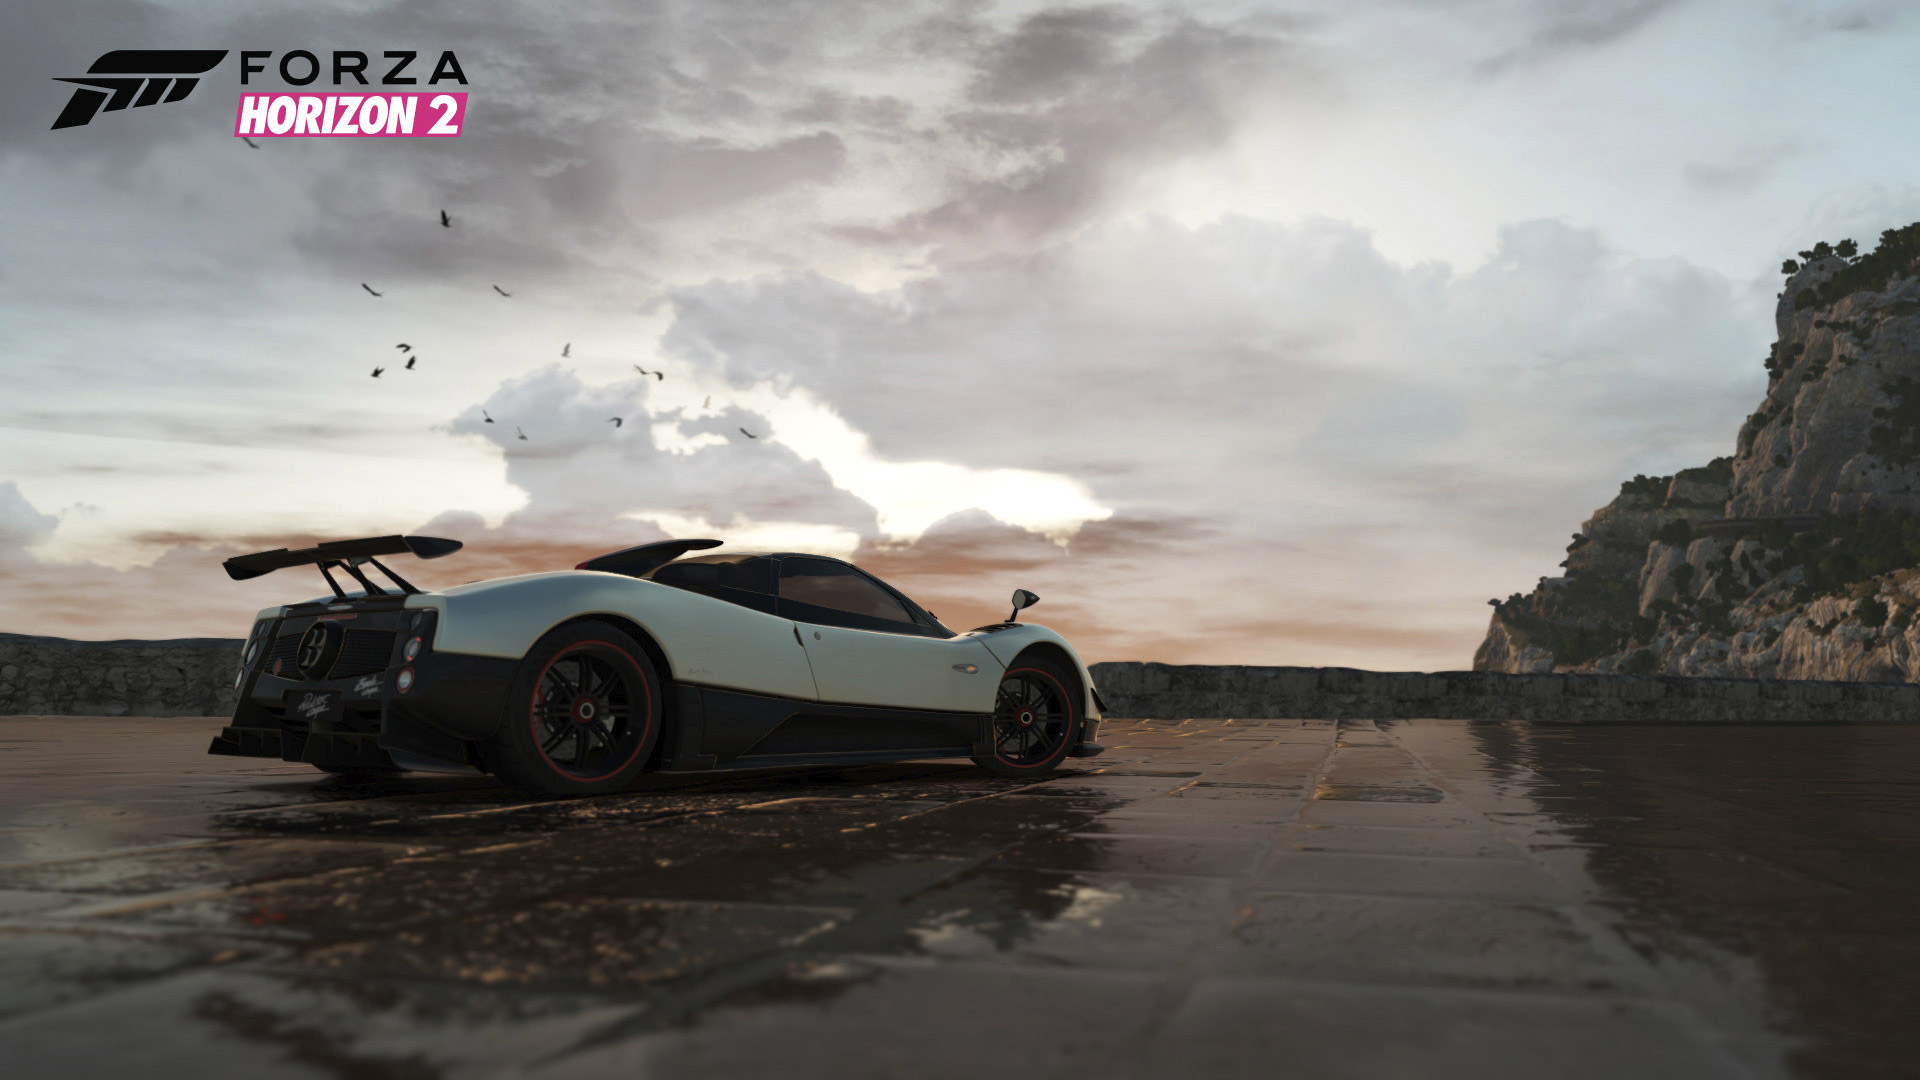 Forza Horizon 2 Wallpaper in 1920x1080